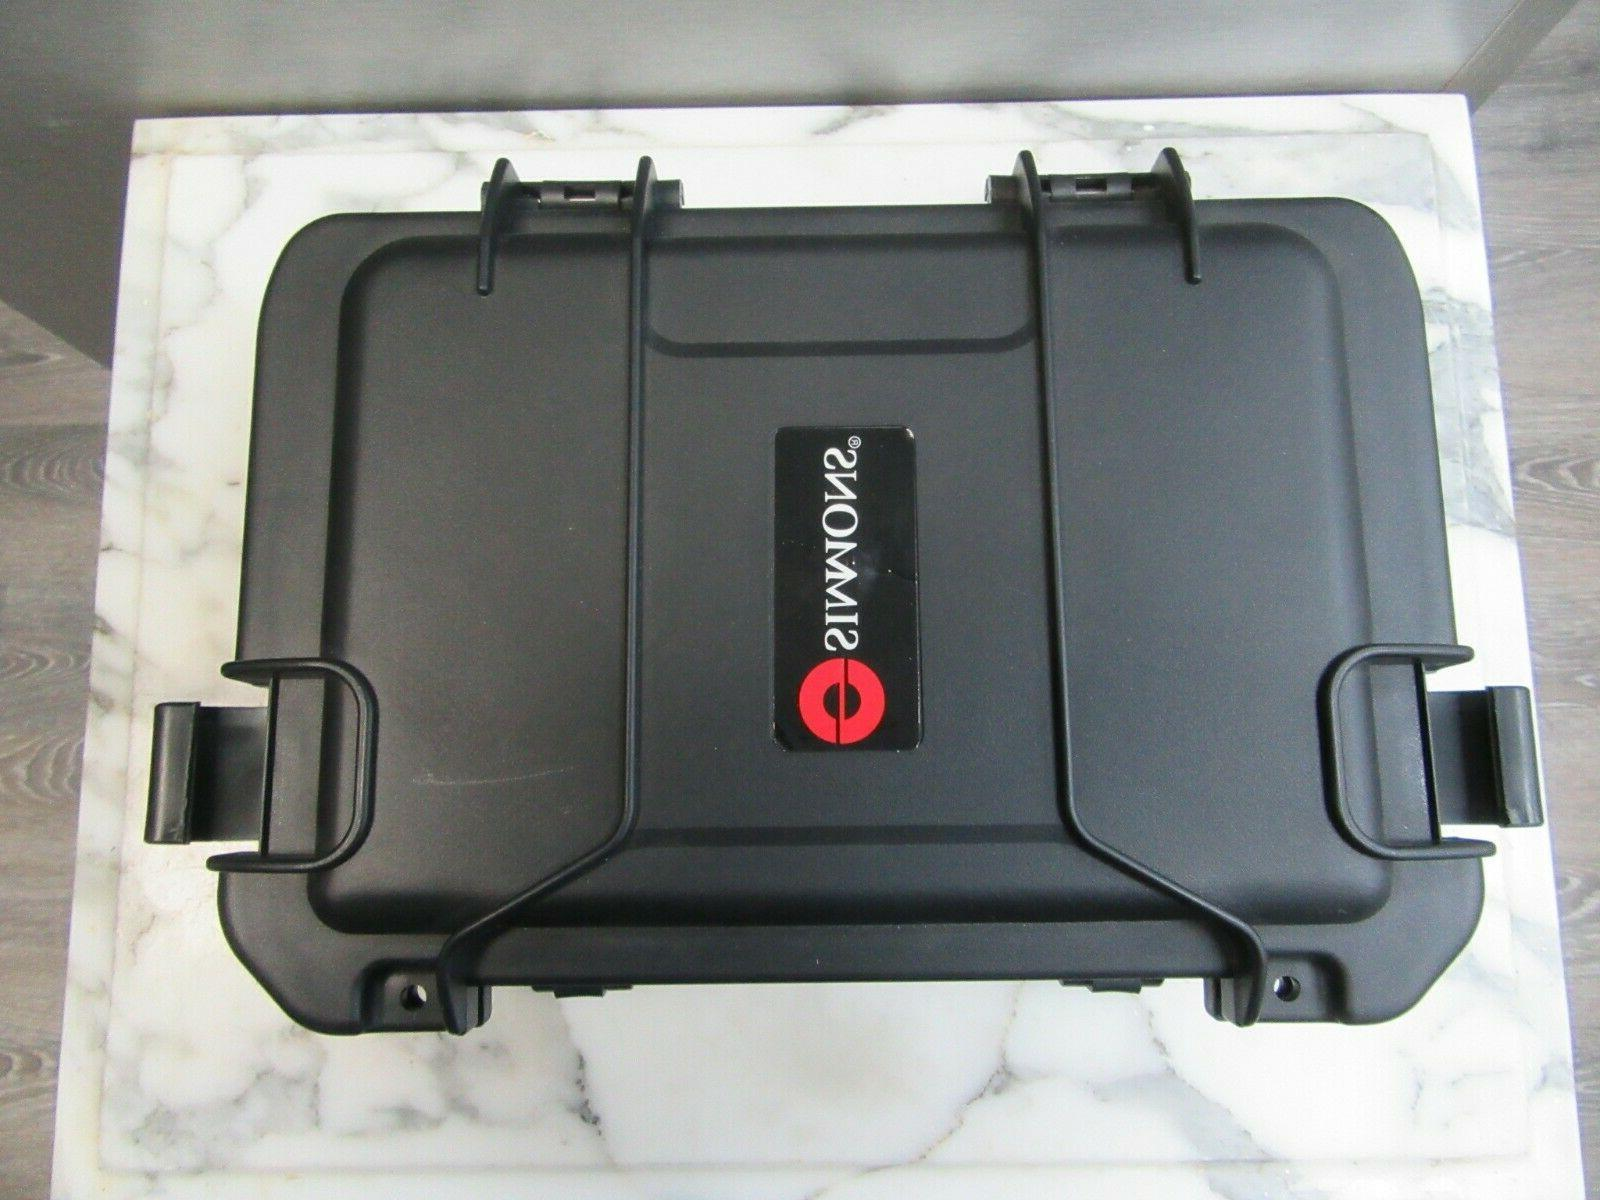 Simmons 600 Laser Rangefinder Binoculars